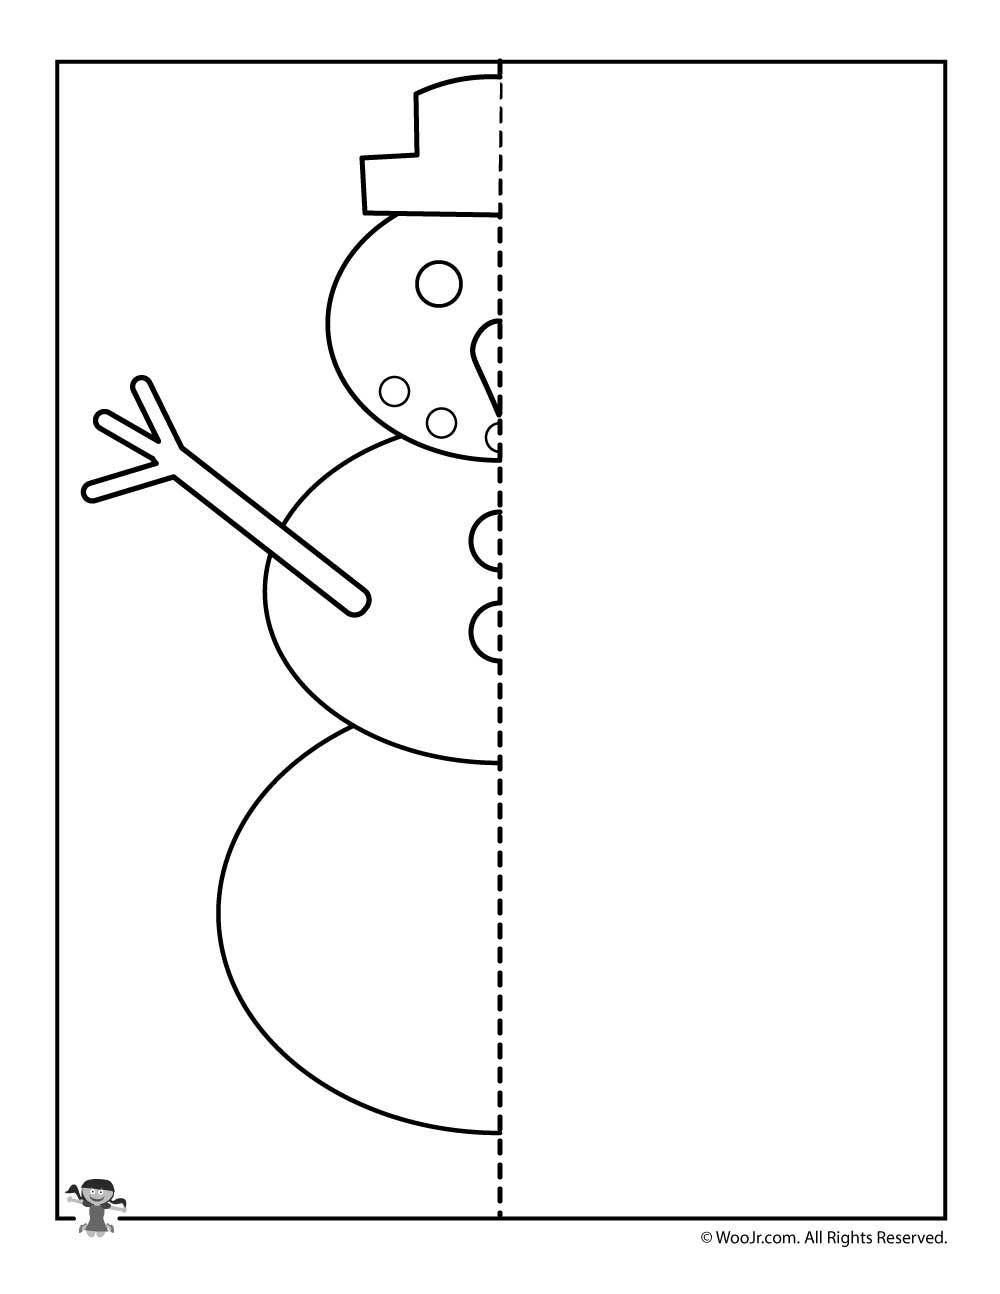 Christmas Mirror Drawing Worksheets Woo Jr Kids Activities Drawing Activities Mirror Drawings Finish The Drawing Worksheets [ 1294 x 1000 Pixel ]